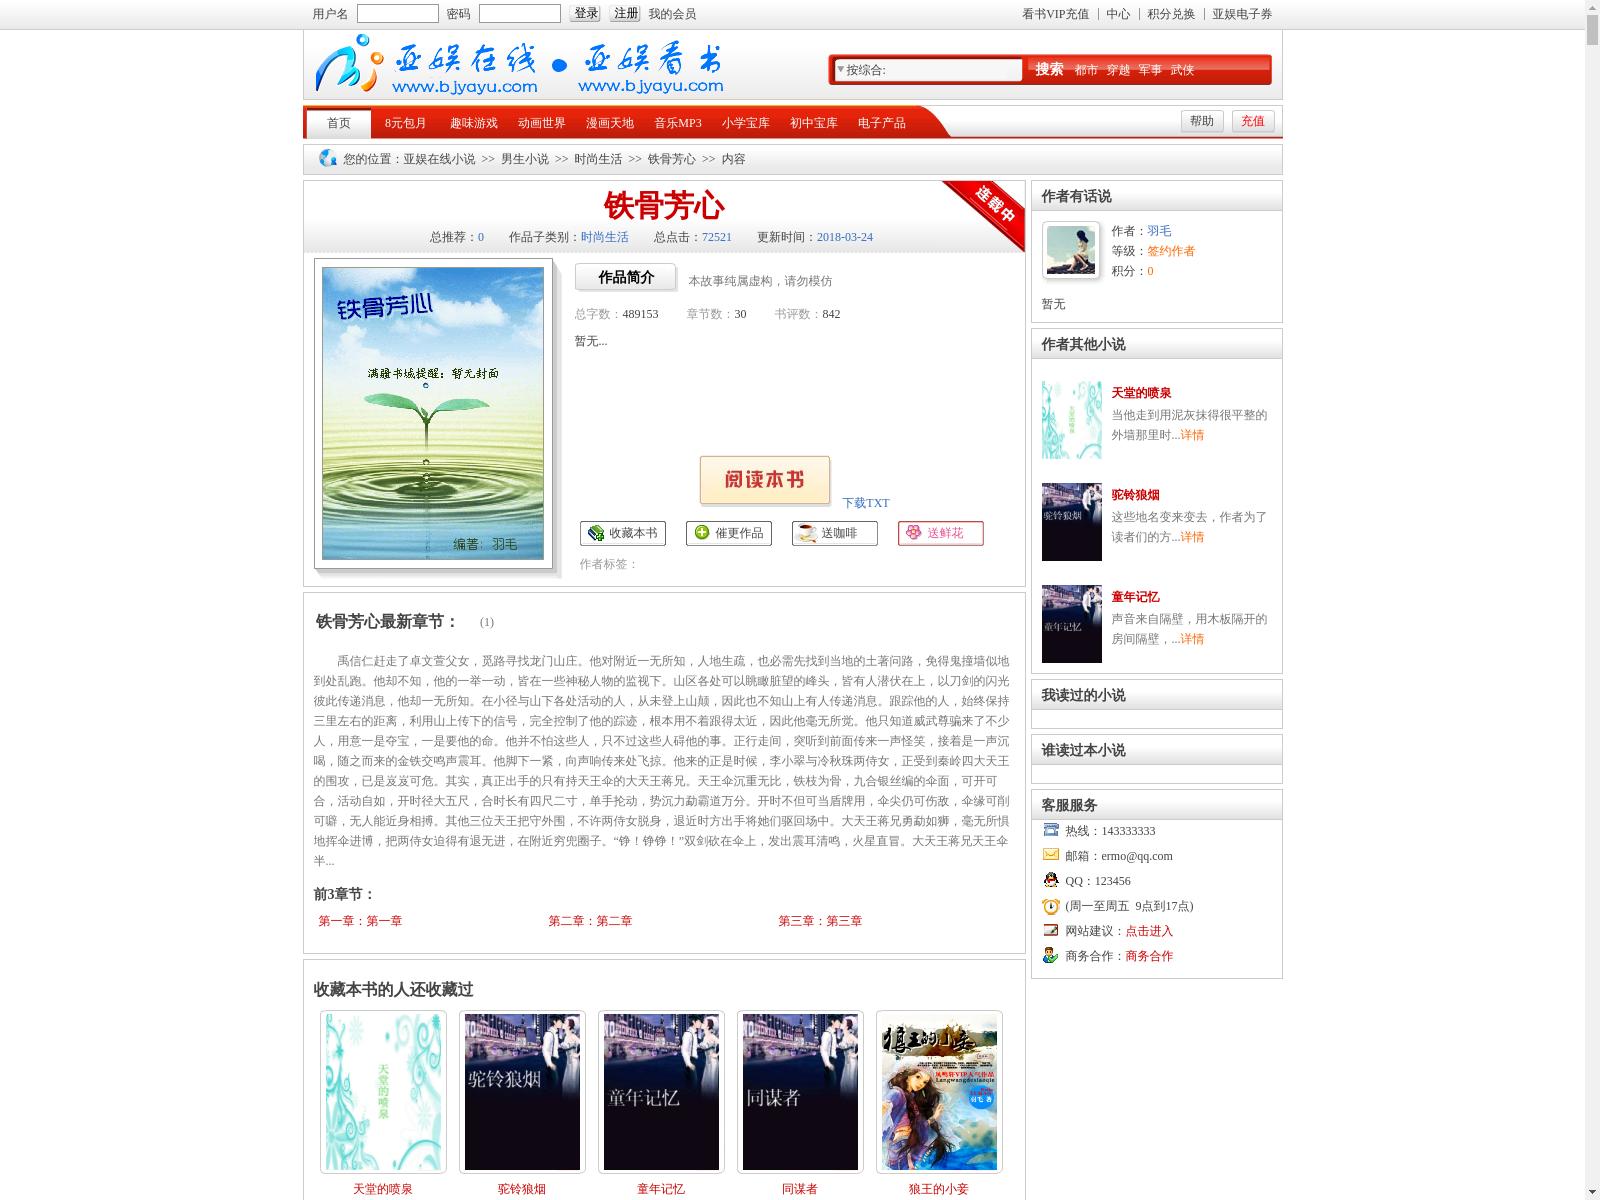 www.bjyayu.com - urlscan.io on